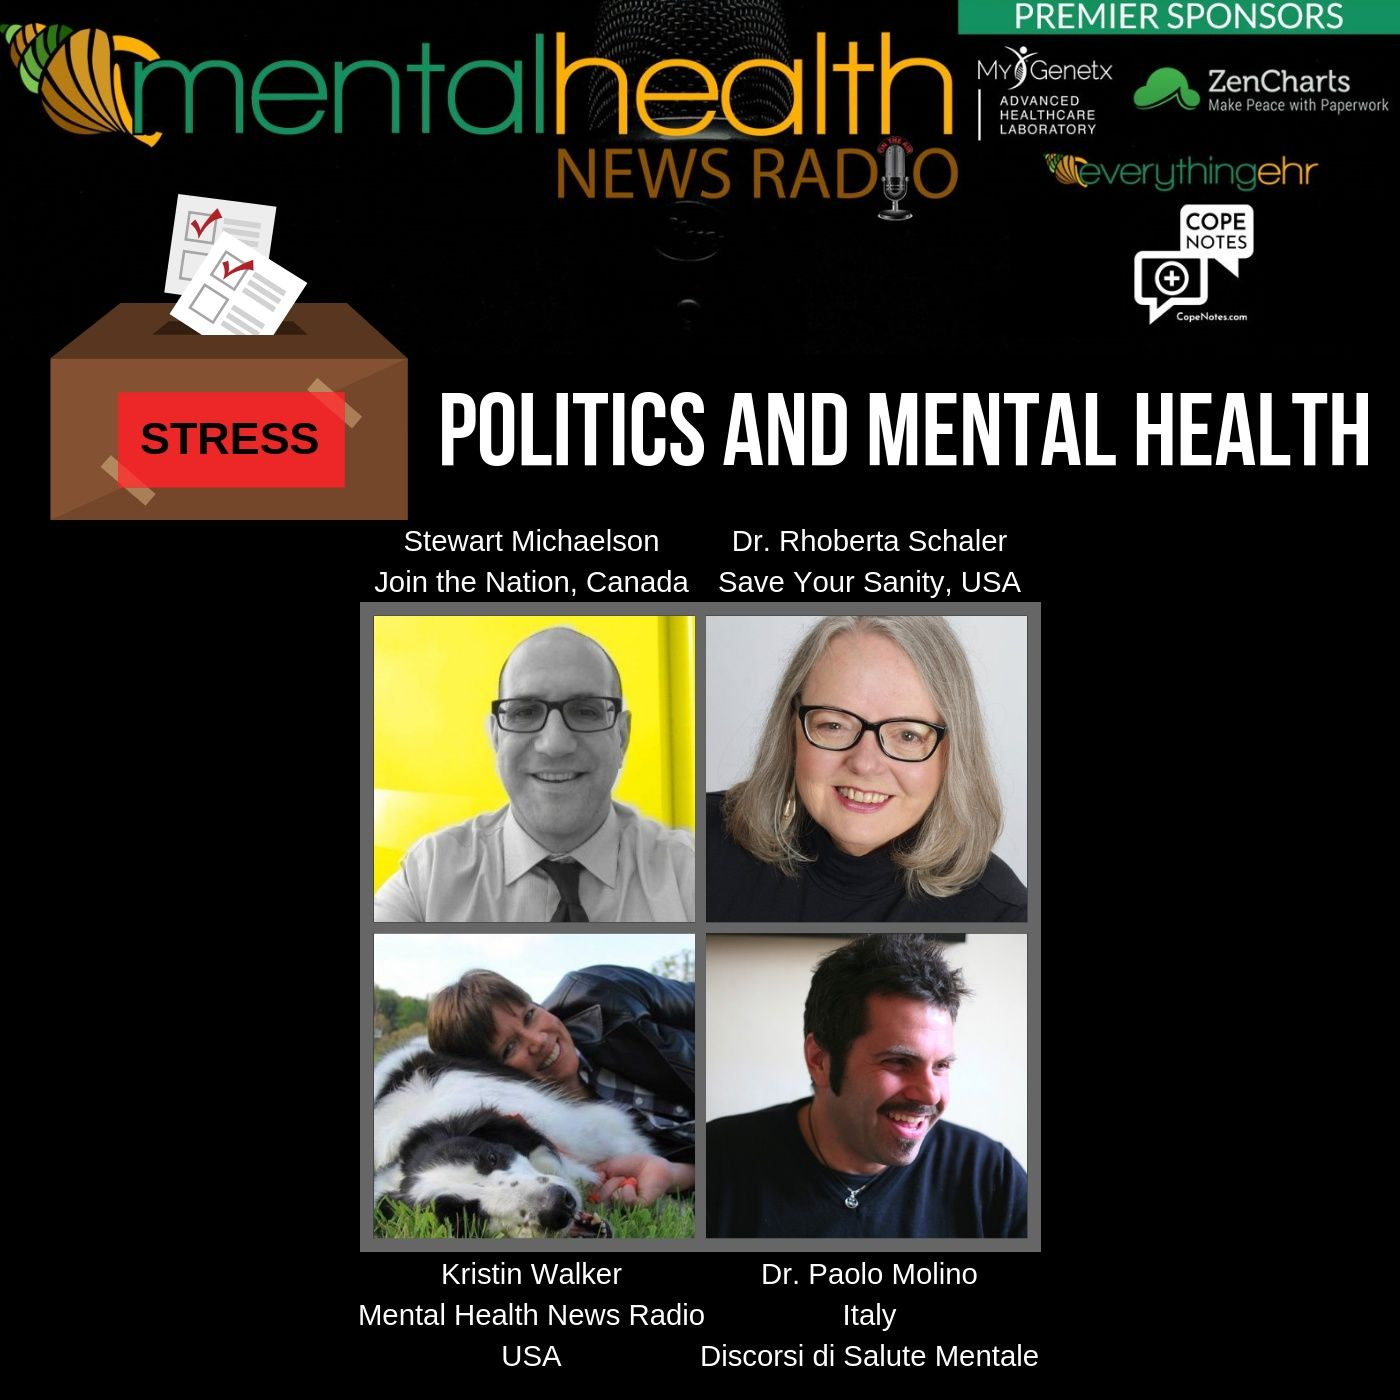 Mental Health News Radio - Politics and Mental Health